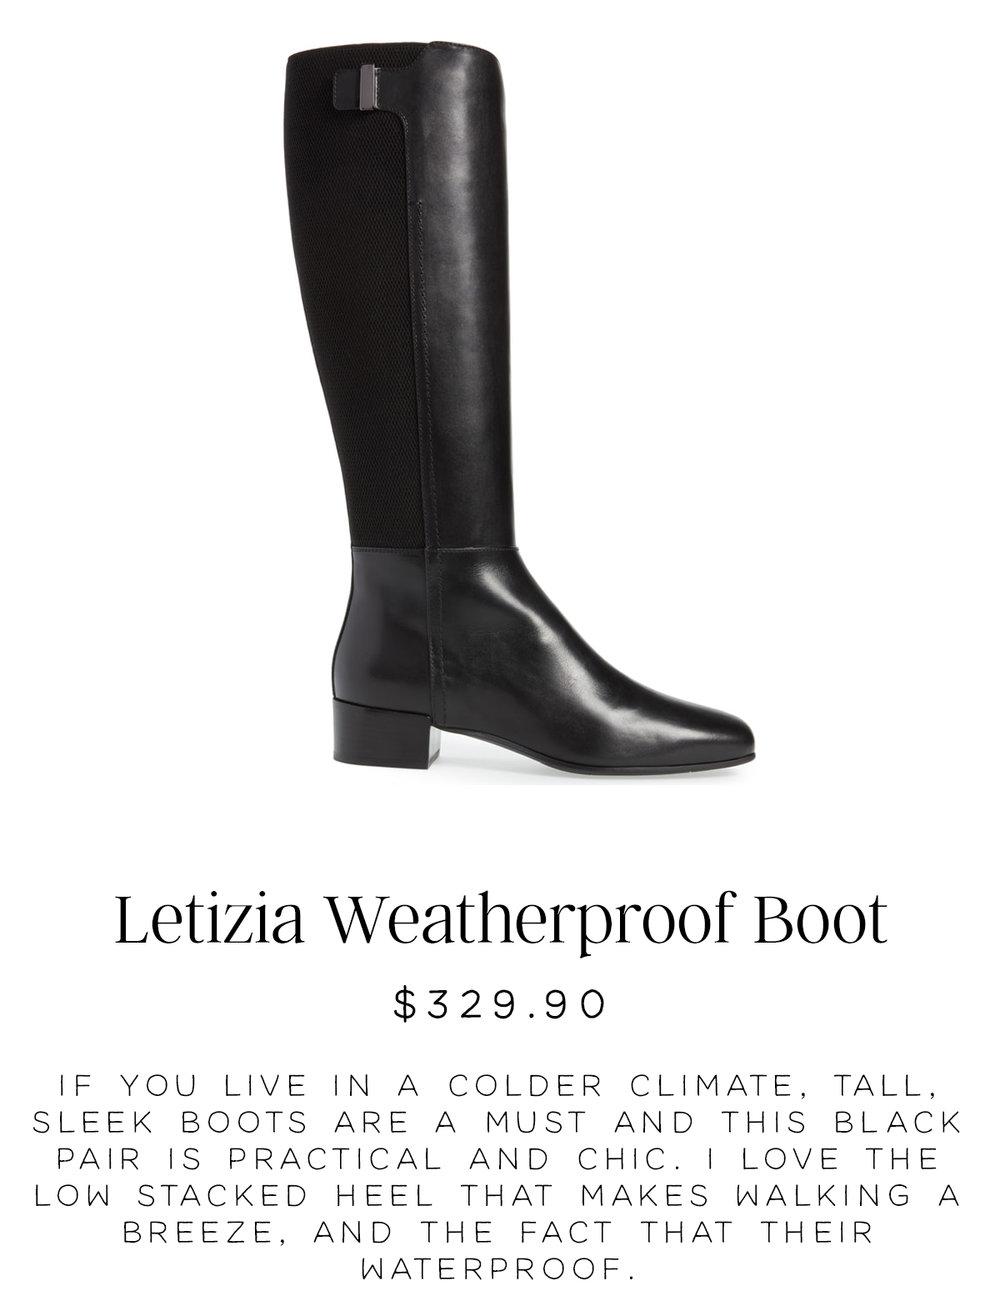 aquatalia-Letizia-Weatherproof-Boot.jpg